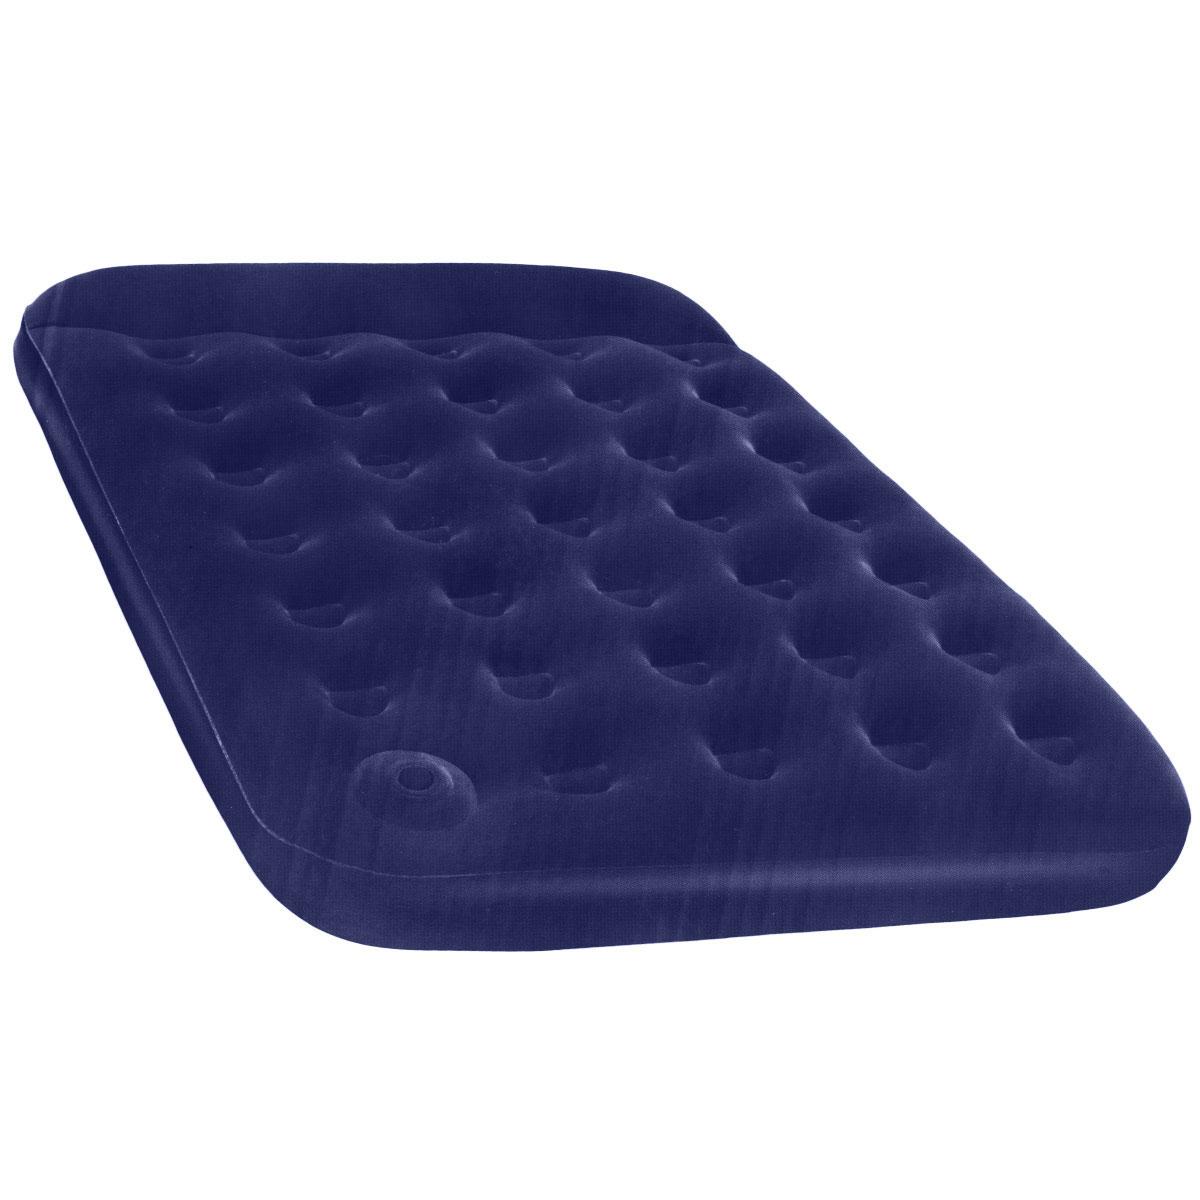 Матрас надувной Bestway, флокированный, цвет: синий, 191 х 137 х 22 см. 67225N